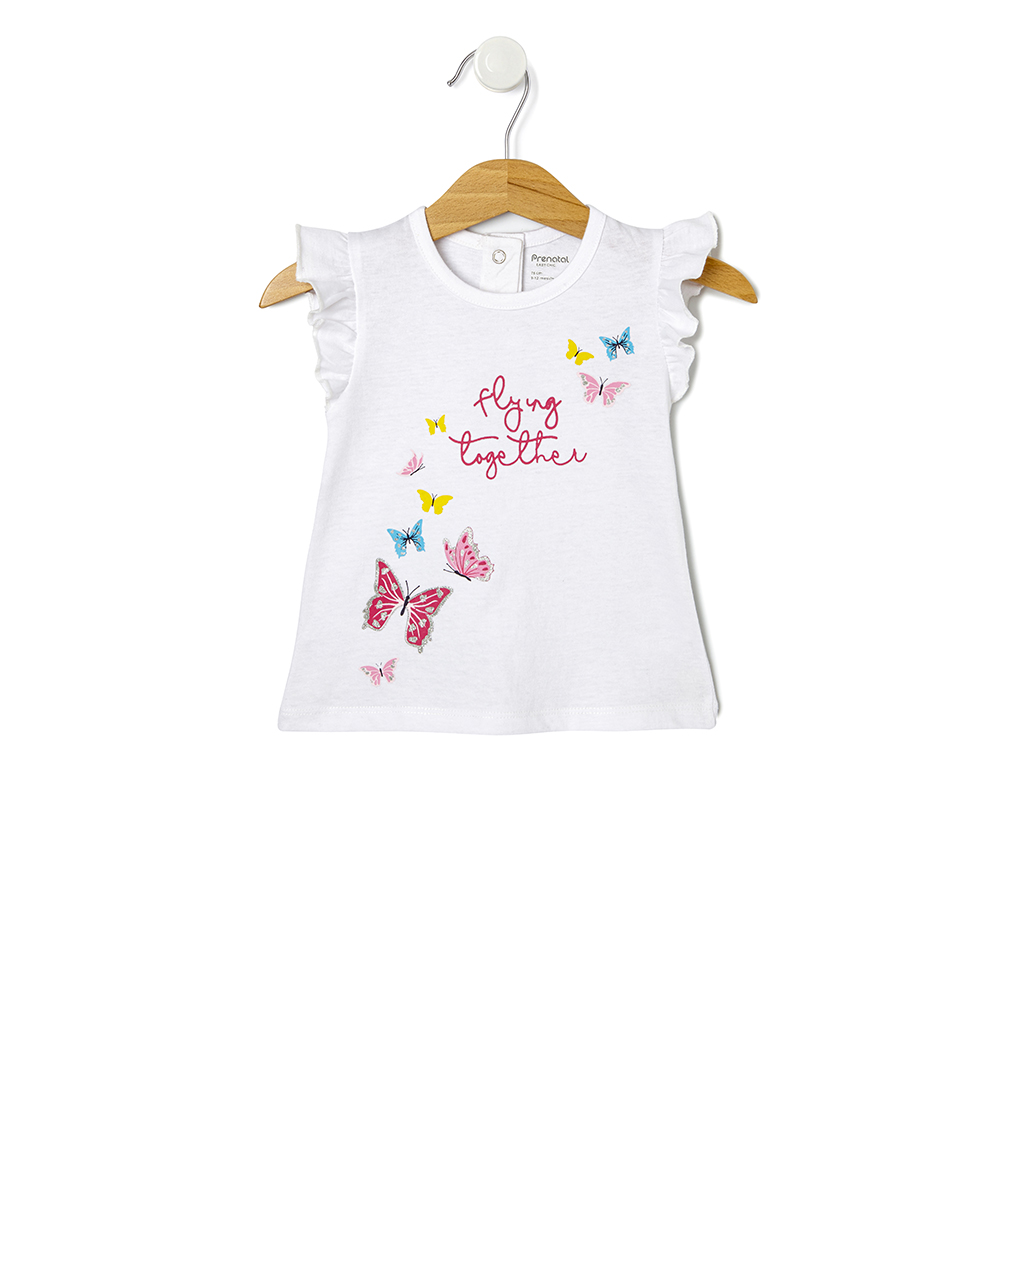 T-Shirt Jersey Λευκό με Στάμπα Πεταλούδες για Κορίτσι